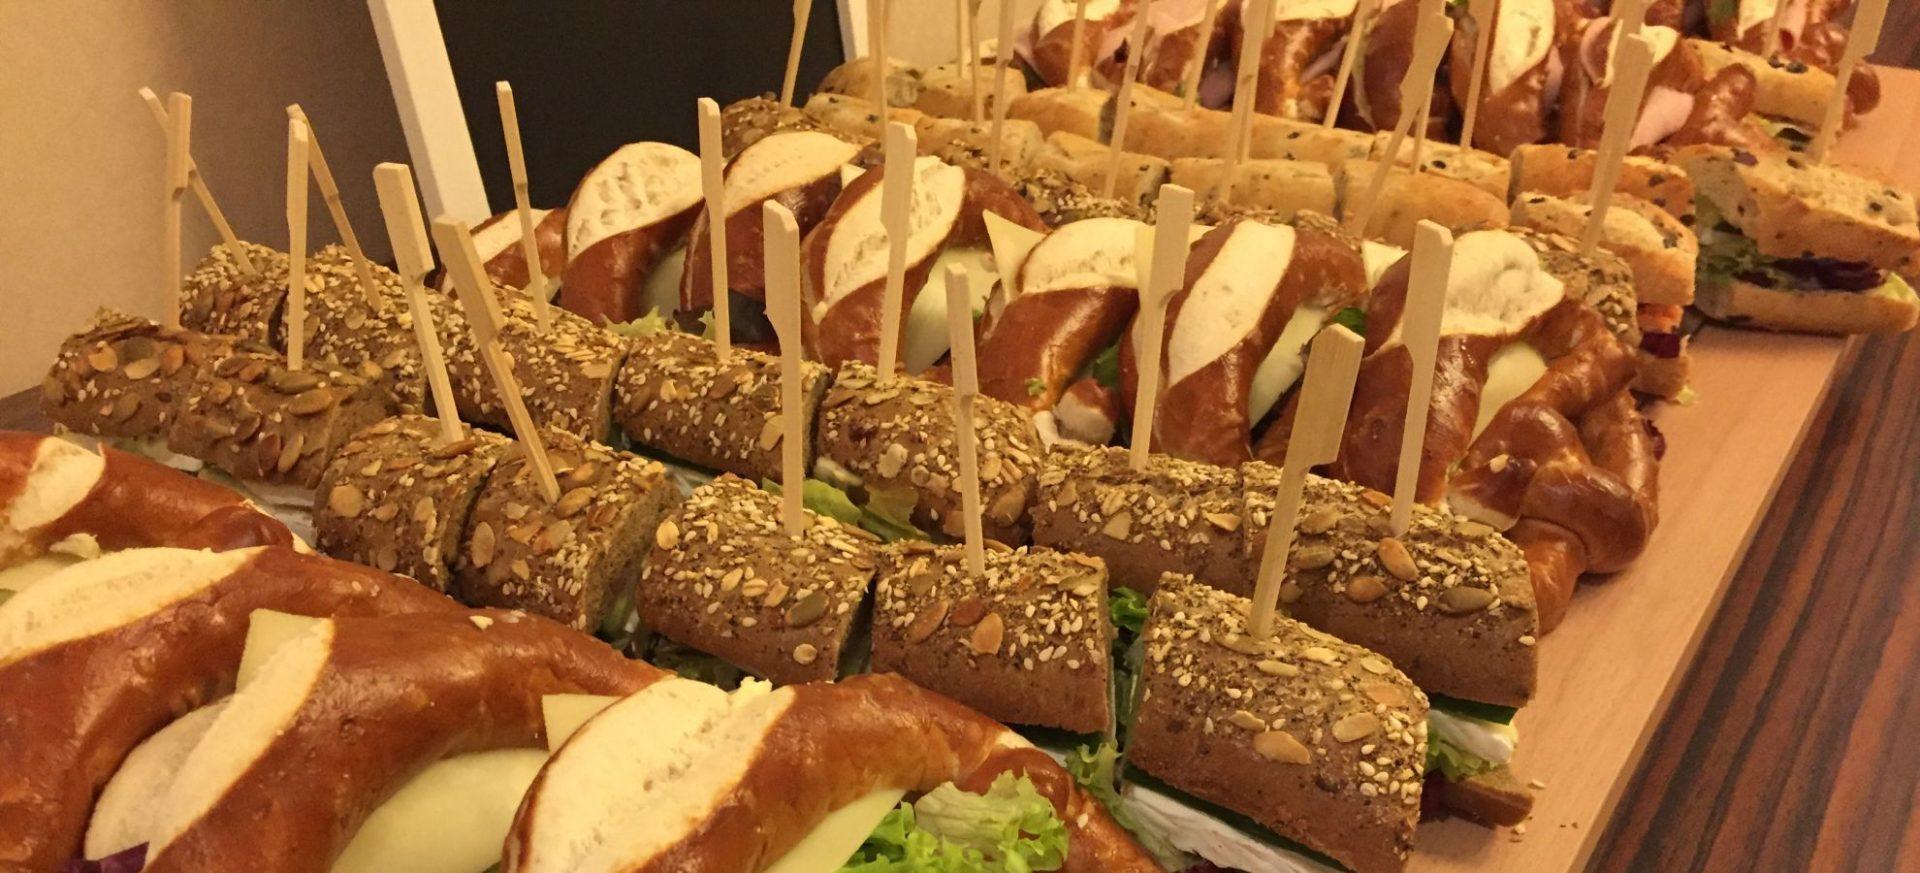 belegte Brezeln - Sandwiches